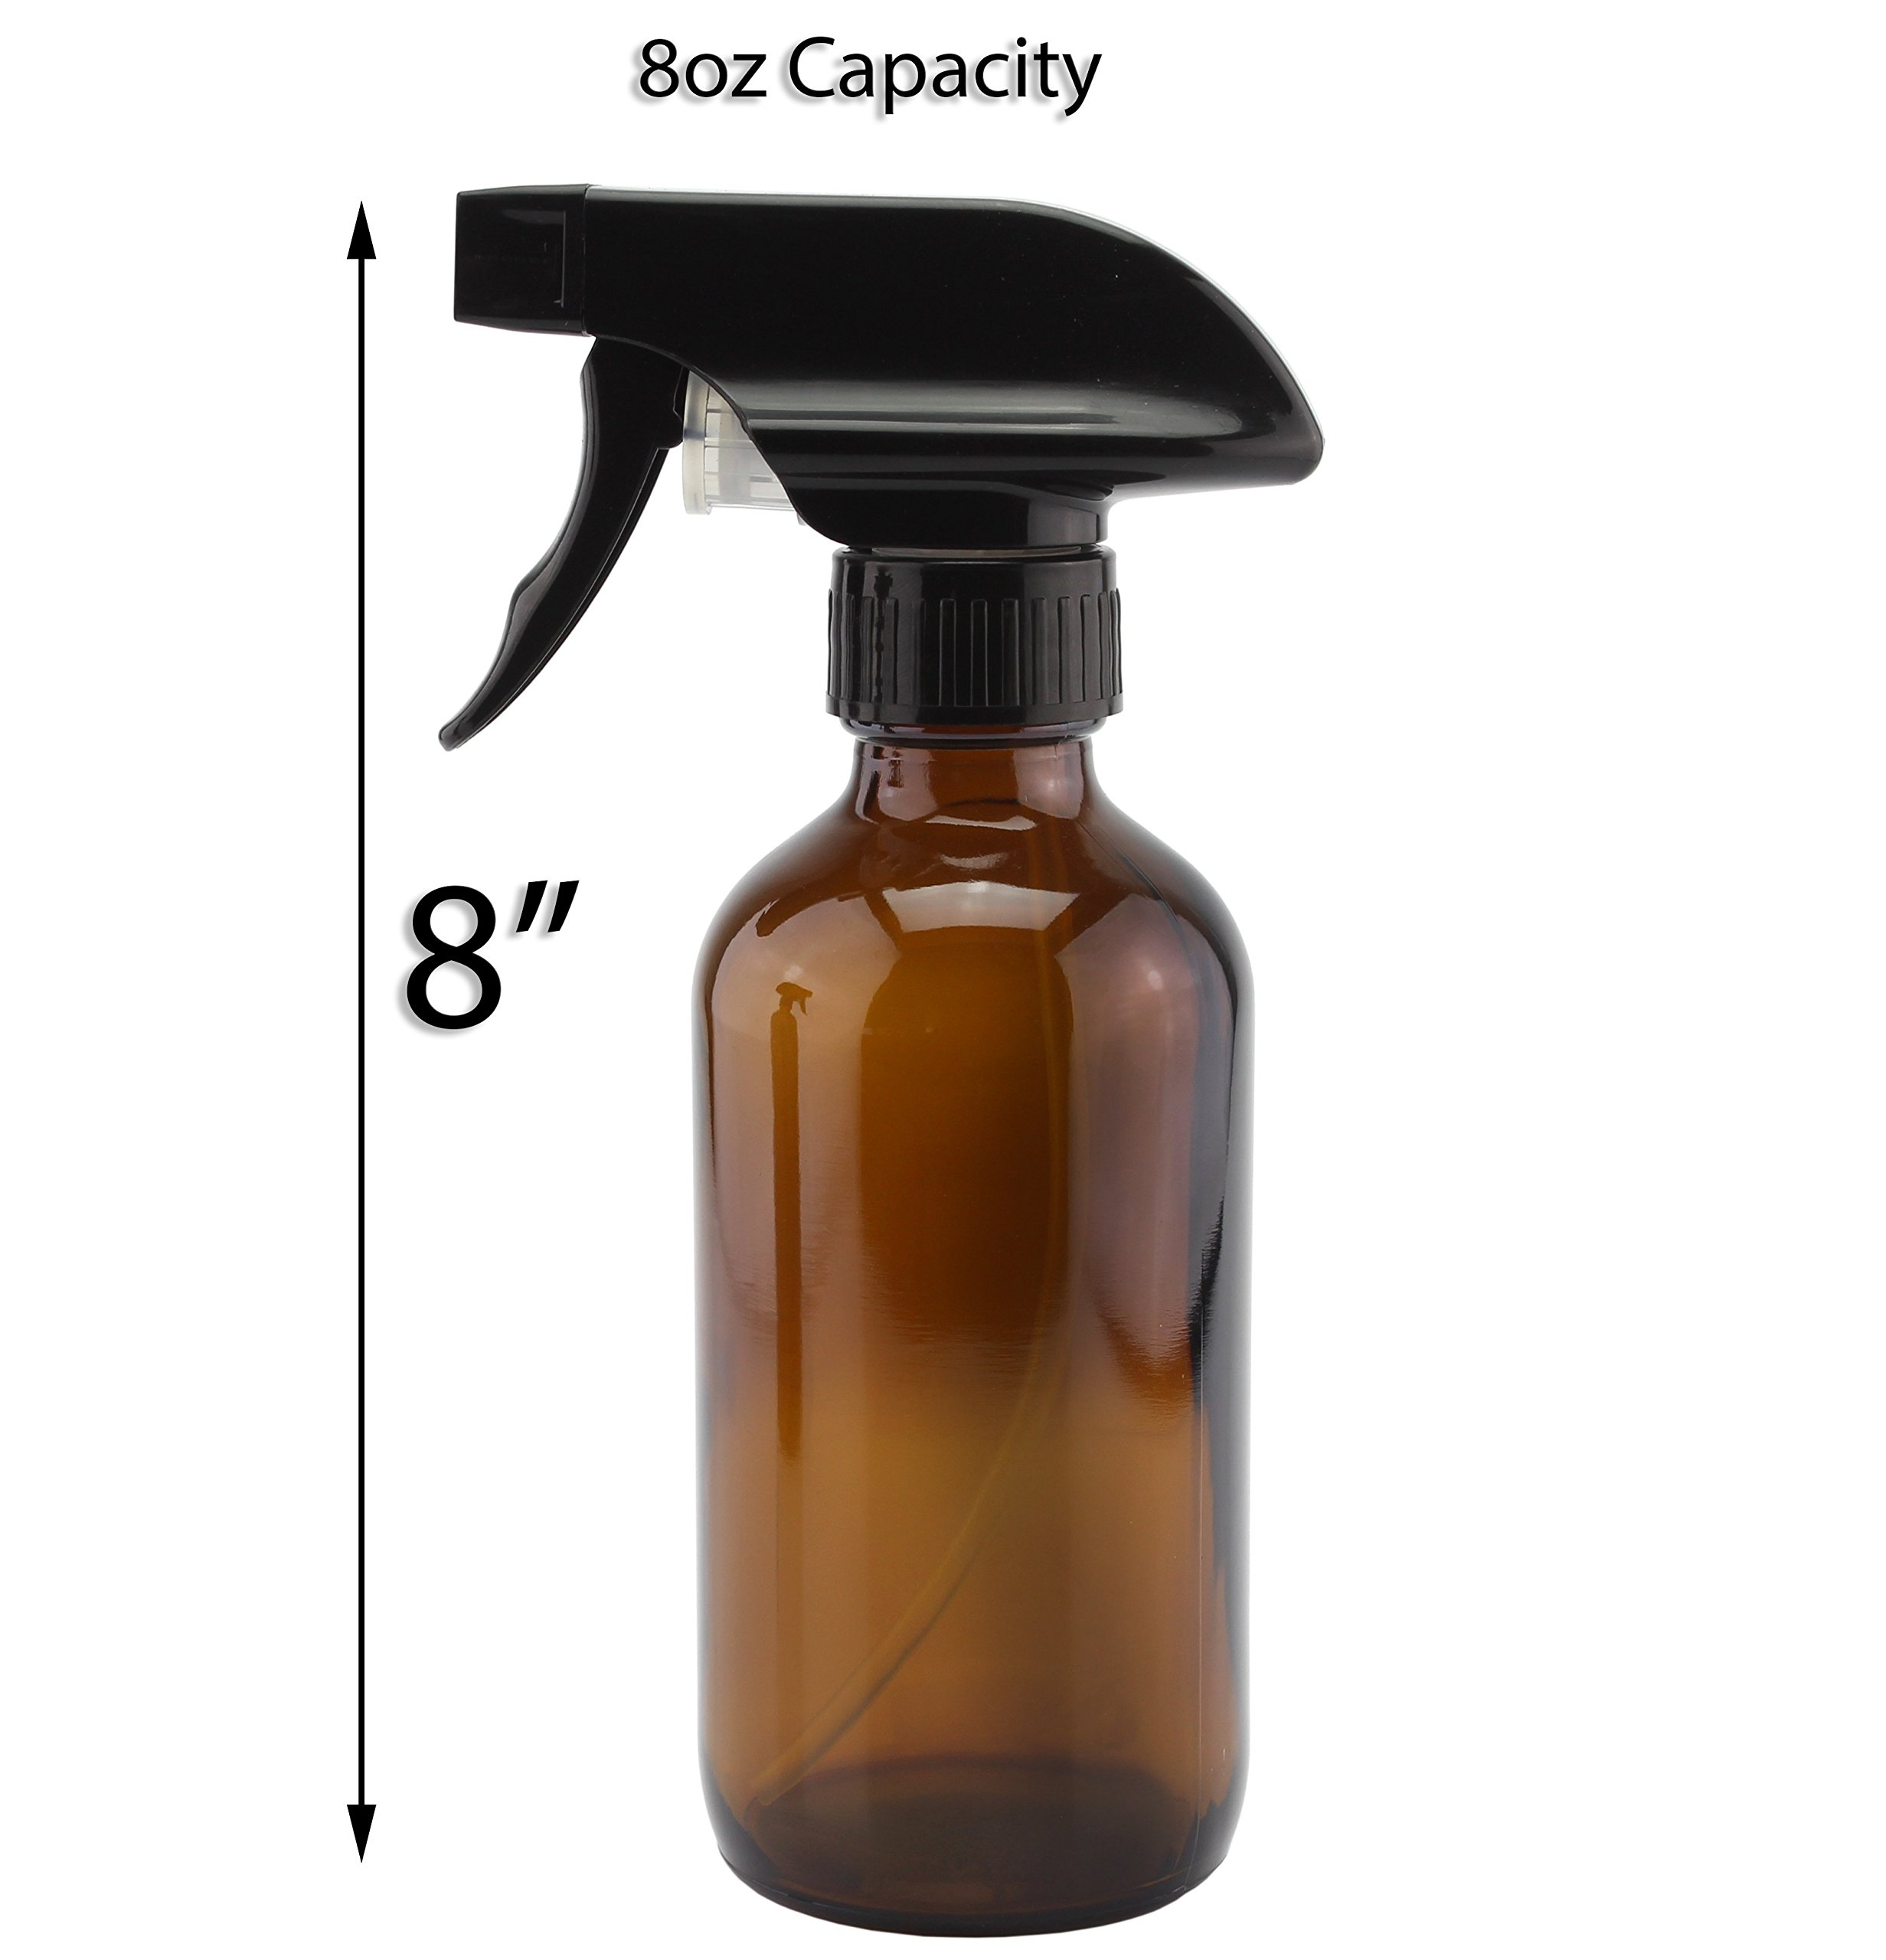 8oz Amber Glass Boston Round Spray Bottles (2 Pack); w/ Heavy Duty Mist & Stream Sprayers Perfect for Essential Oil Blends by Cornucopia Brands (Image #4)